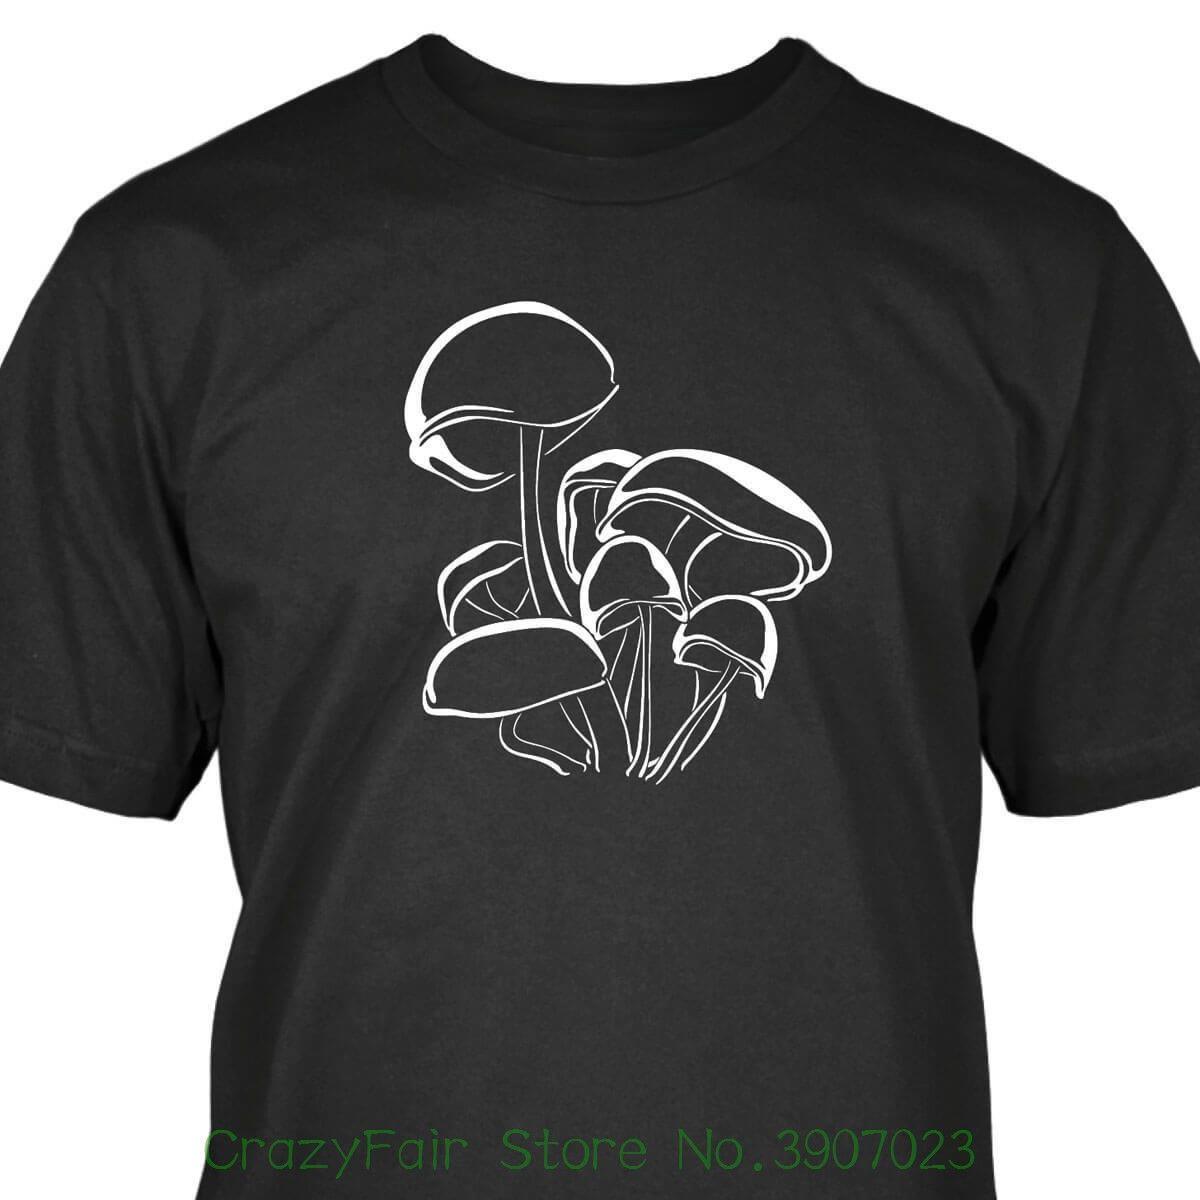 a50894da9 Magic Mushrooms T Shirt Men Tee Shirt Tops Short Sleeve Cotton Fitness T  Shirts Order T Shirts Quality T Shirts From Crazyfairstore, $24.2|  DHgate.Com